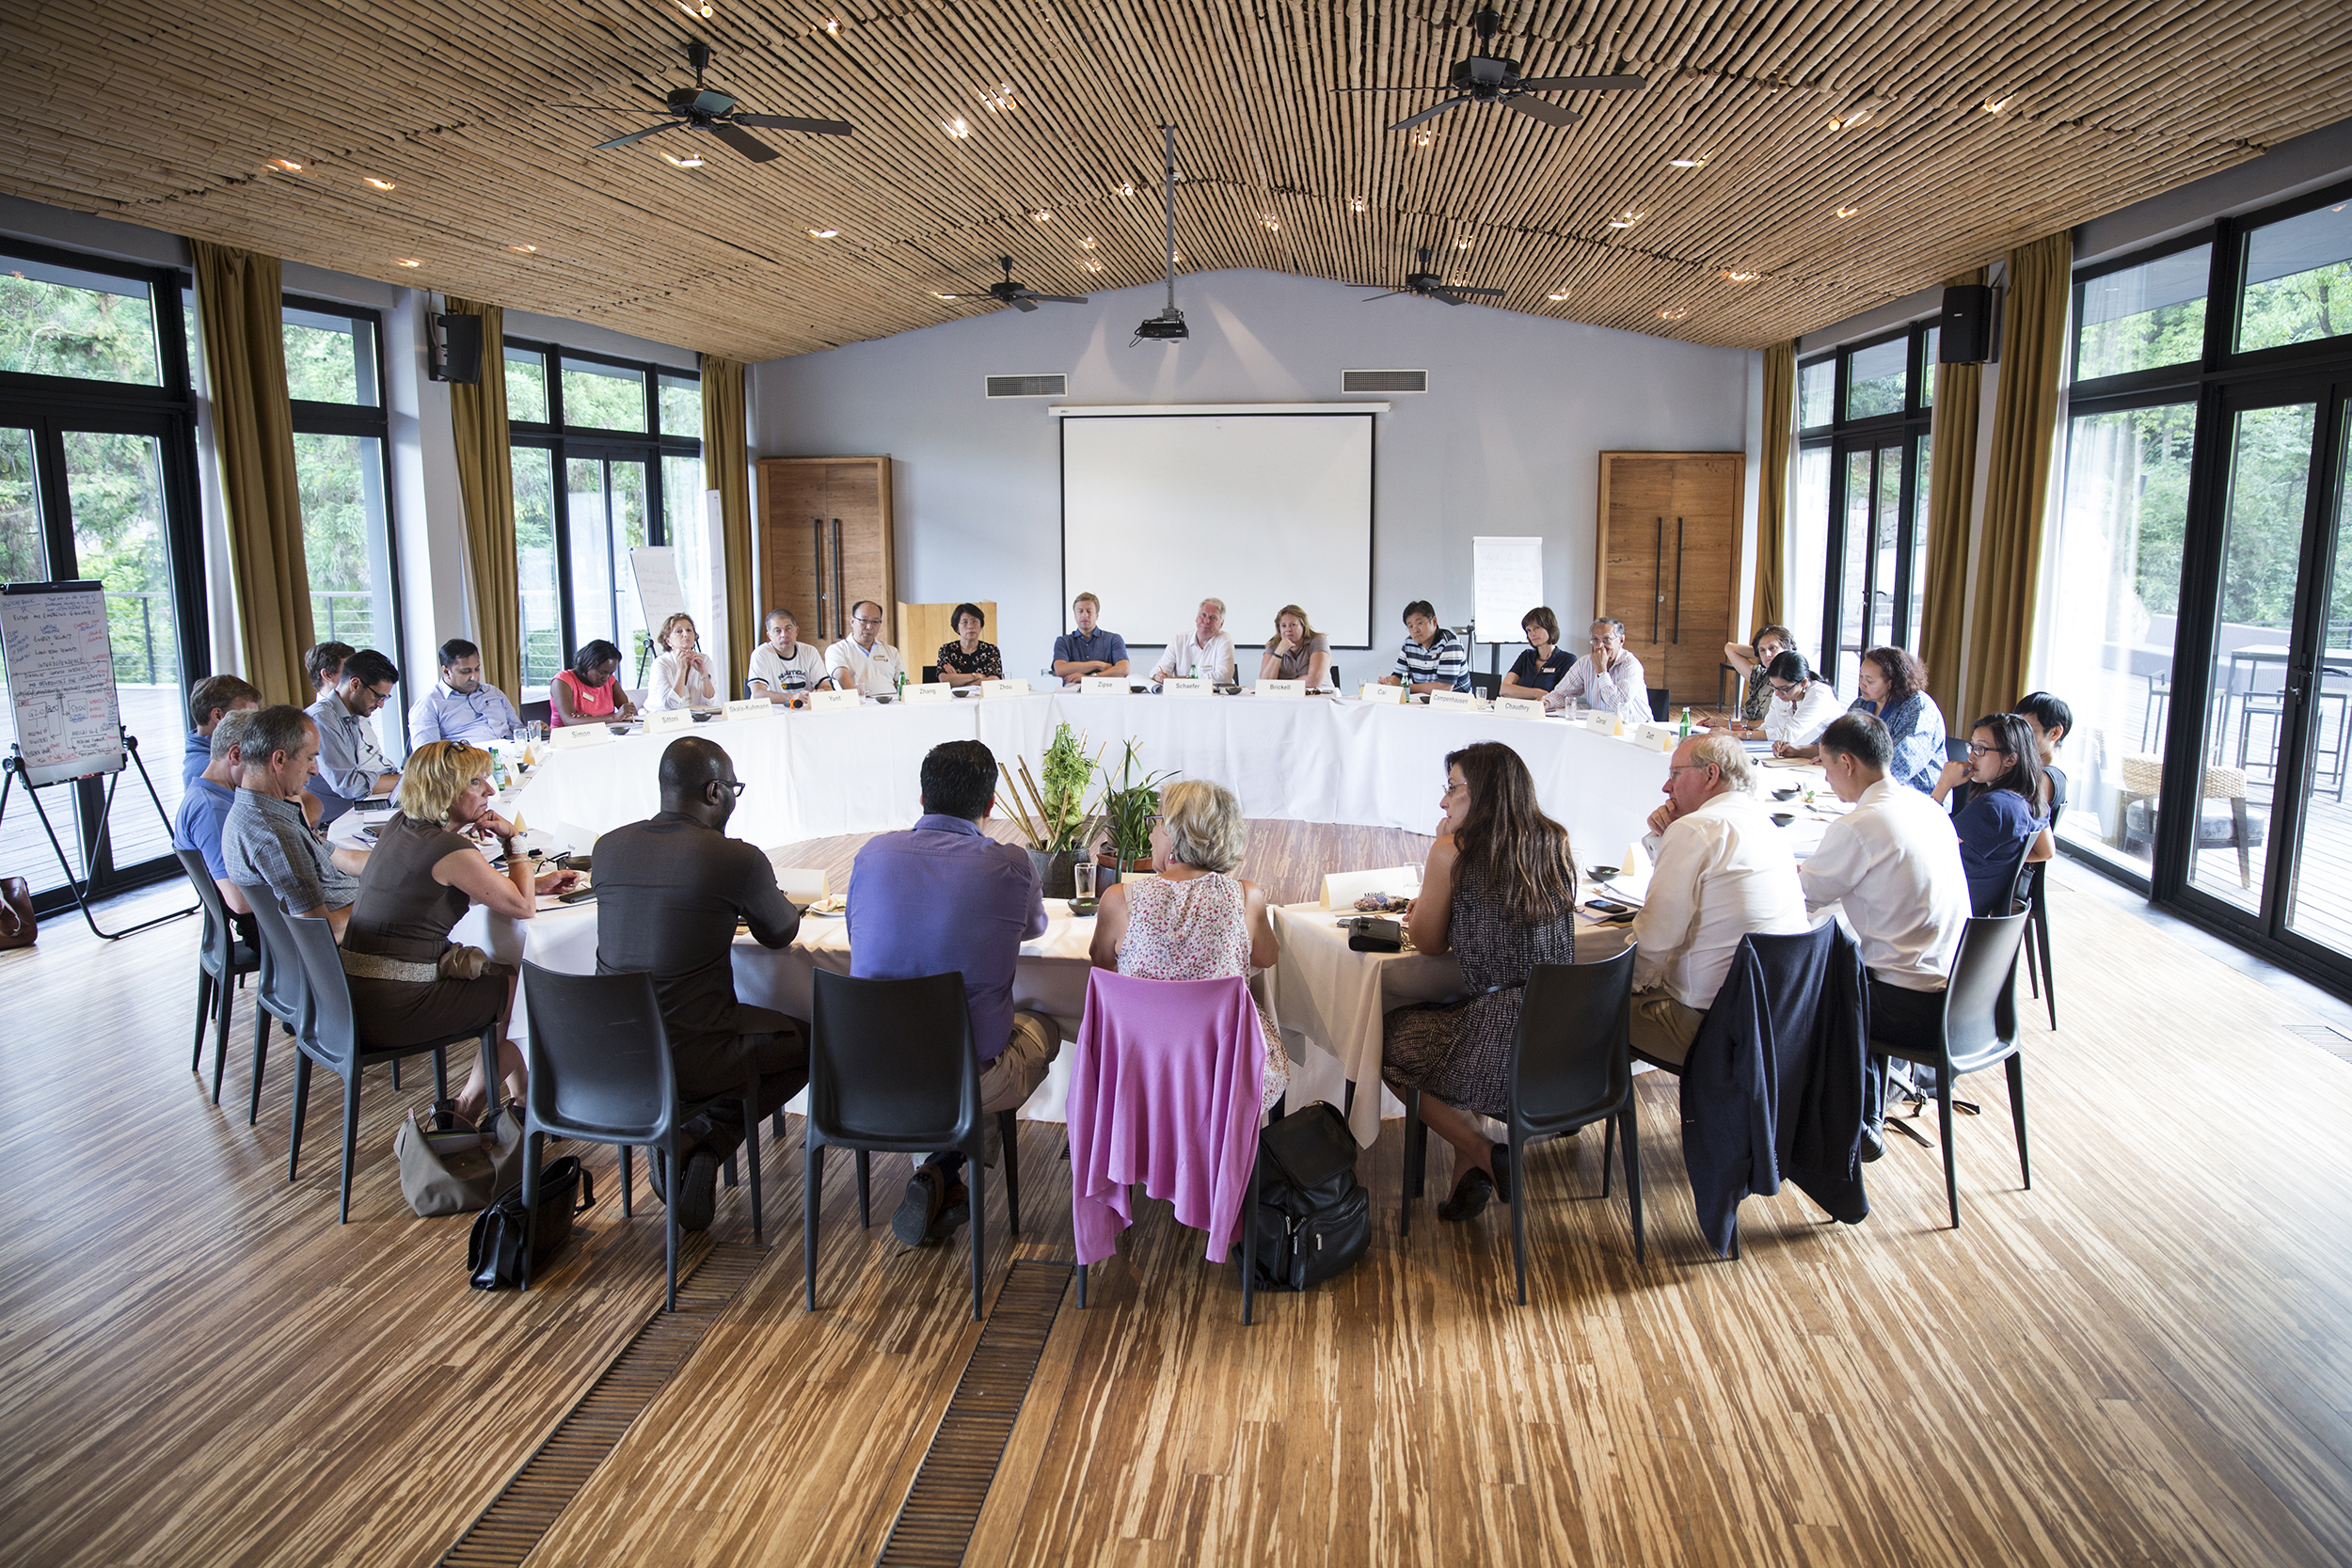 Roundtable talks_1RoundTable in China__MG_3619_CLeisinger.jpg